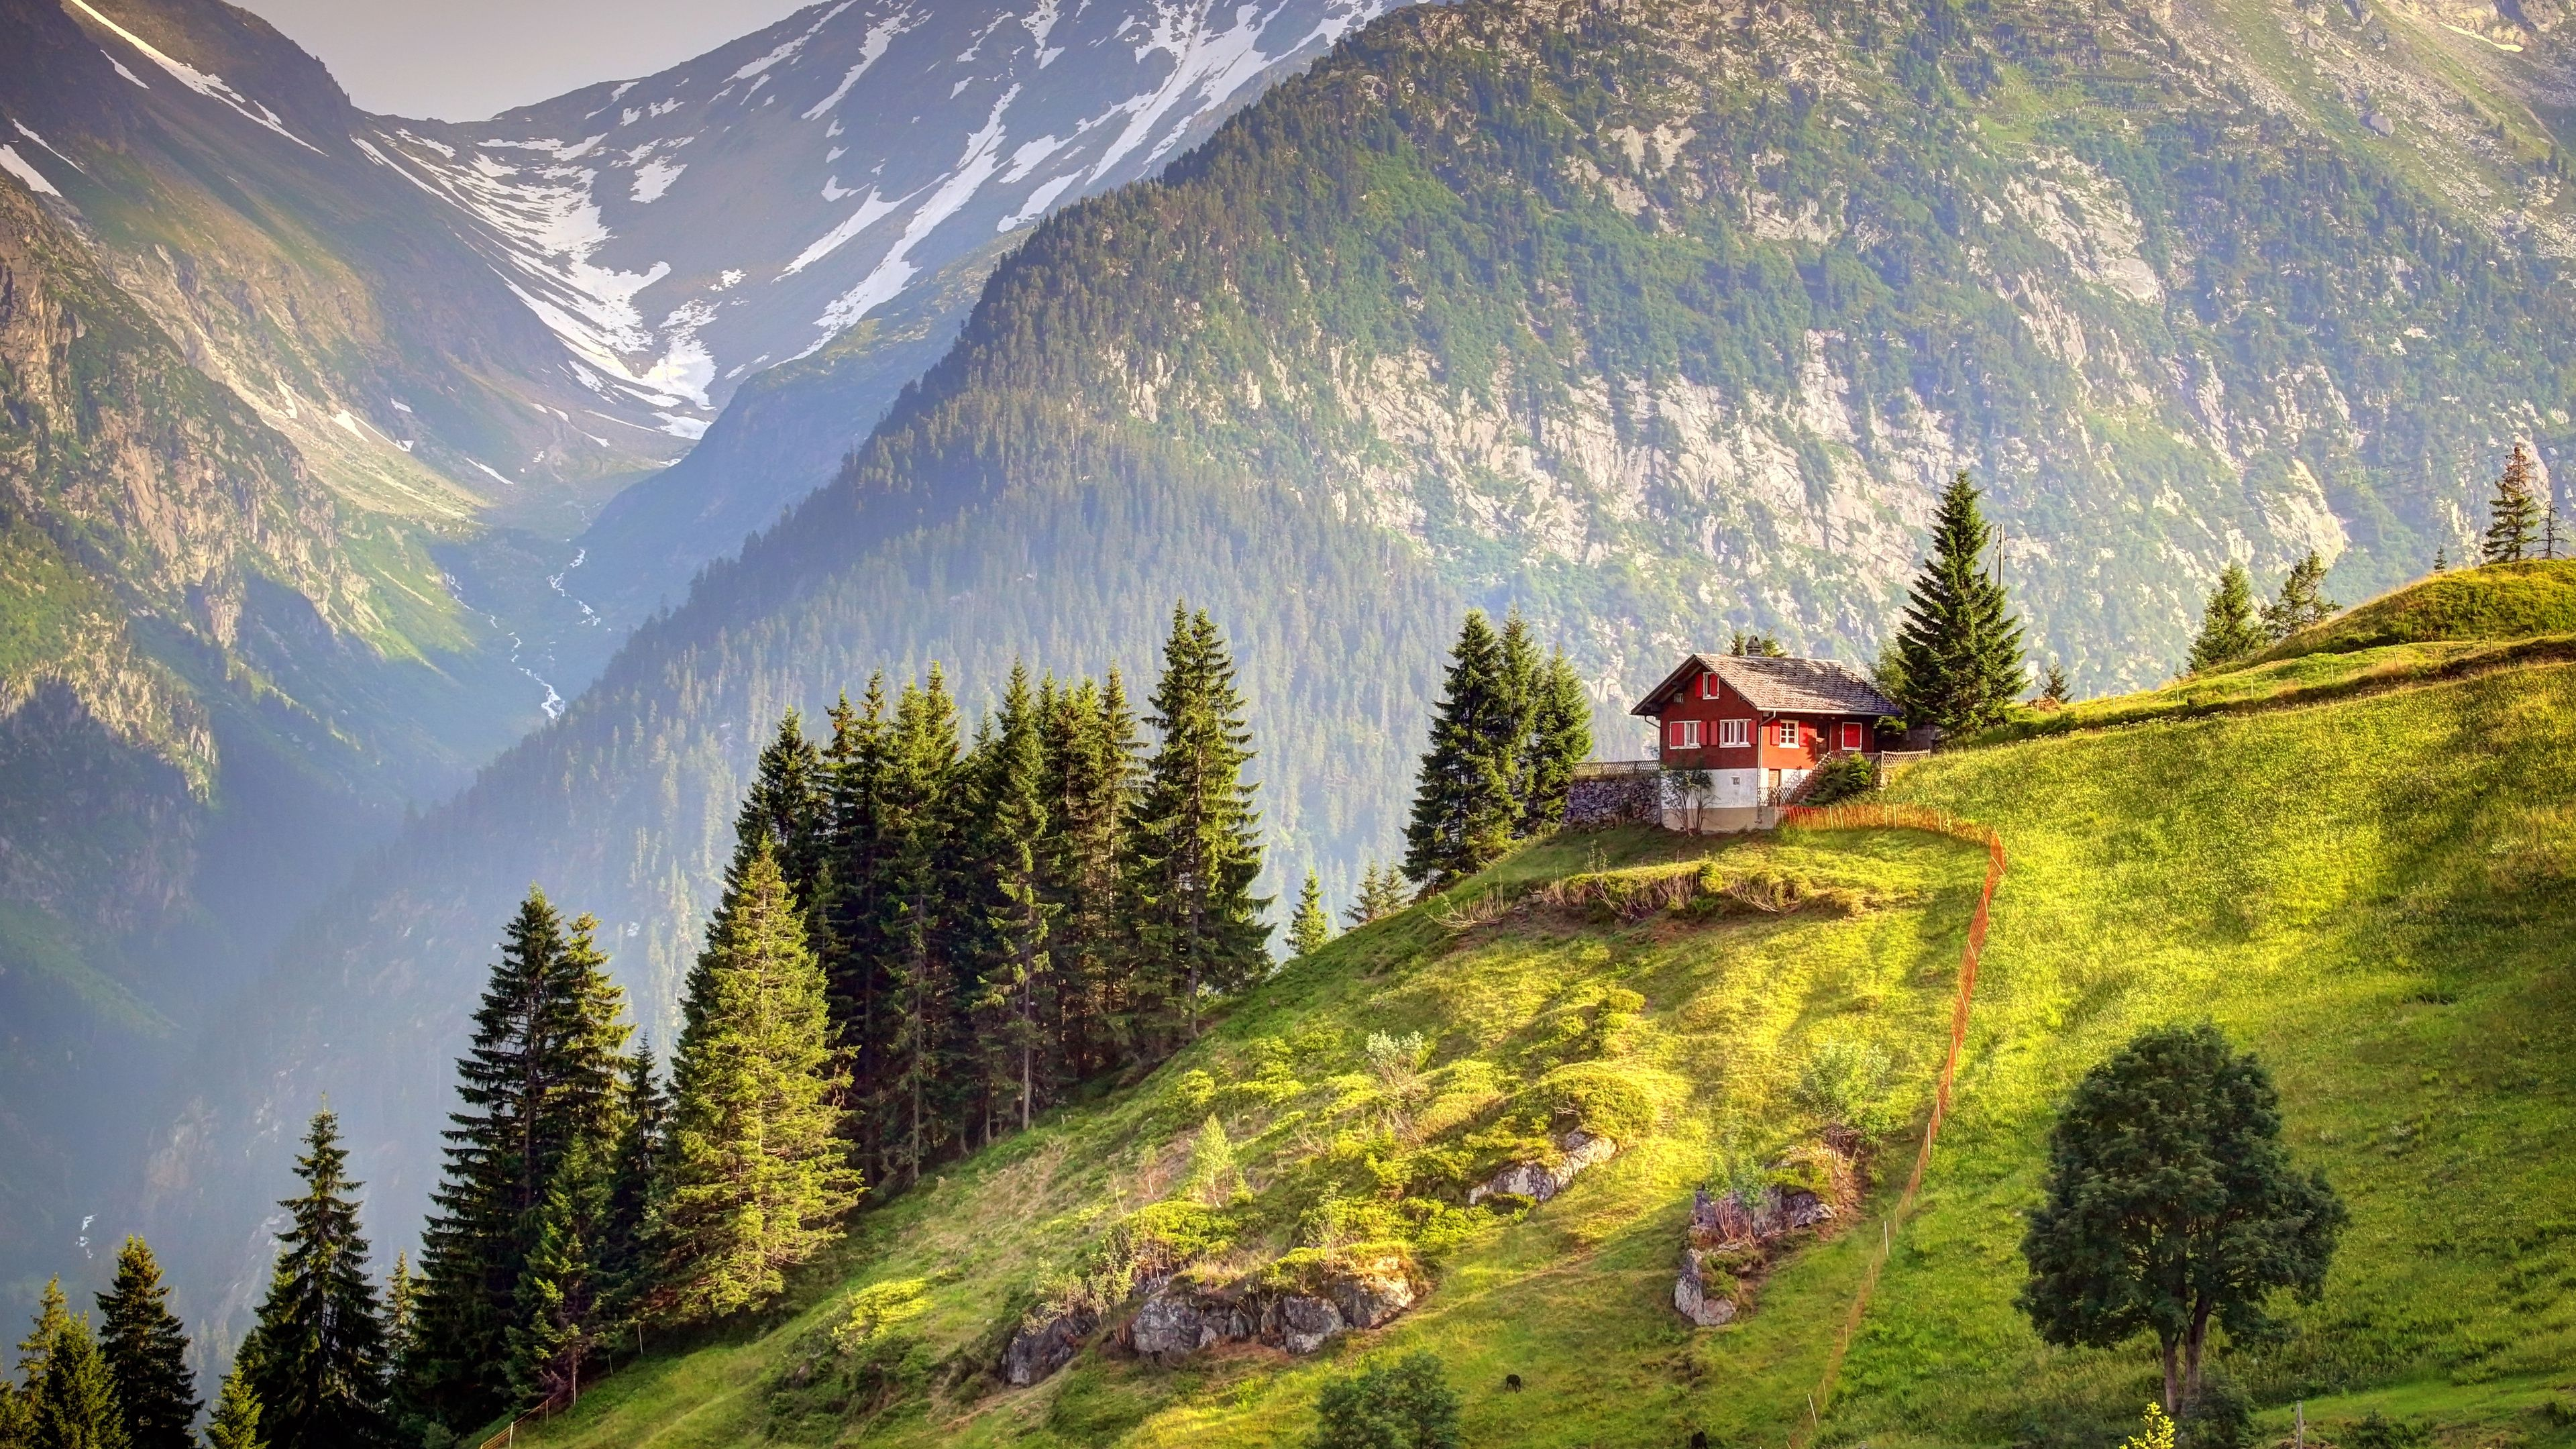 Excellent Switzerland Wallpaper Landscape Wallpaper Switzerland Wallpaper Nature Wallpaper